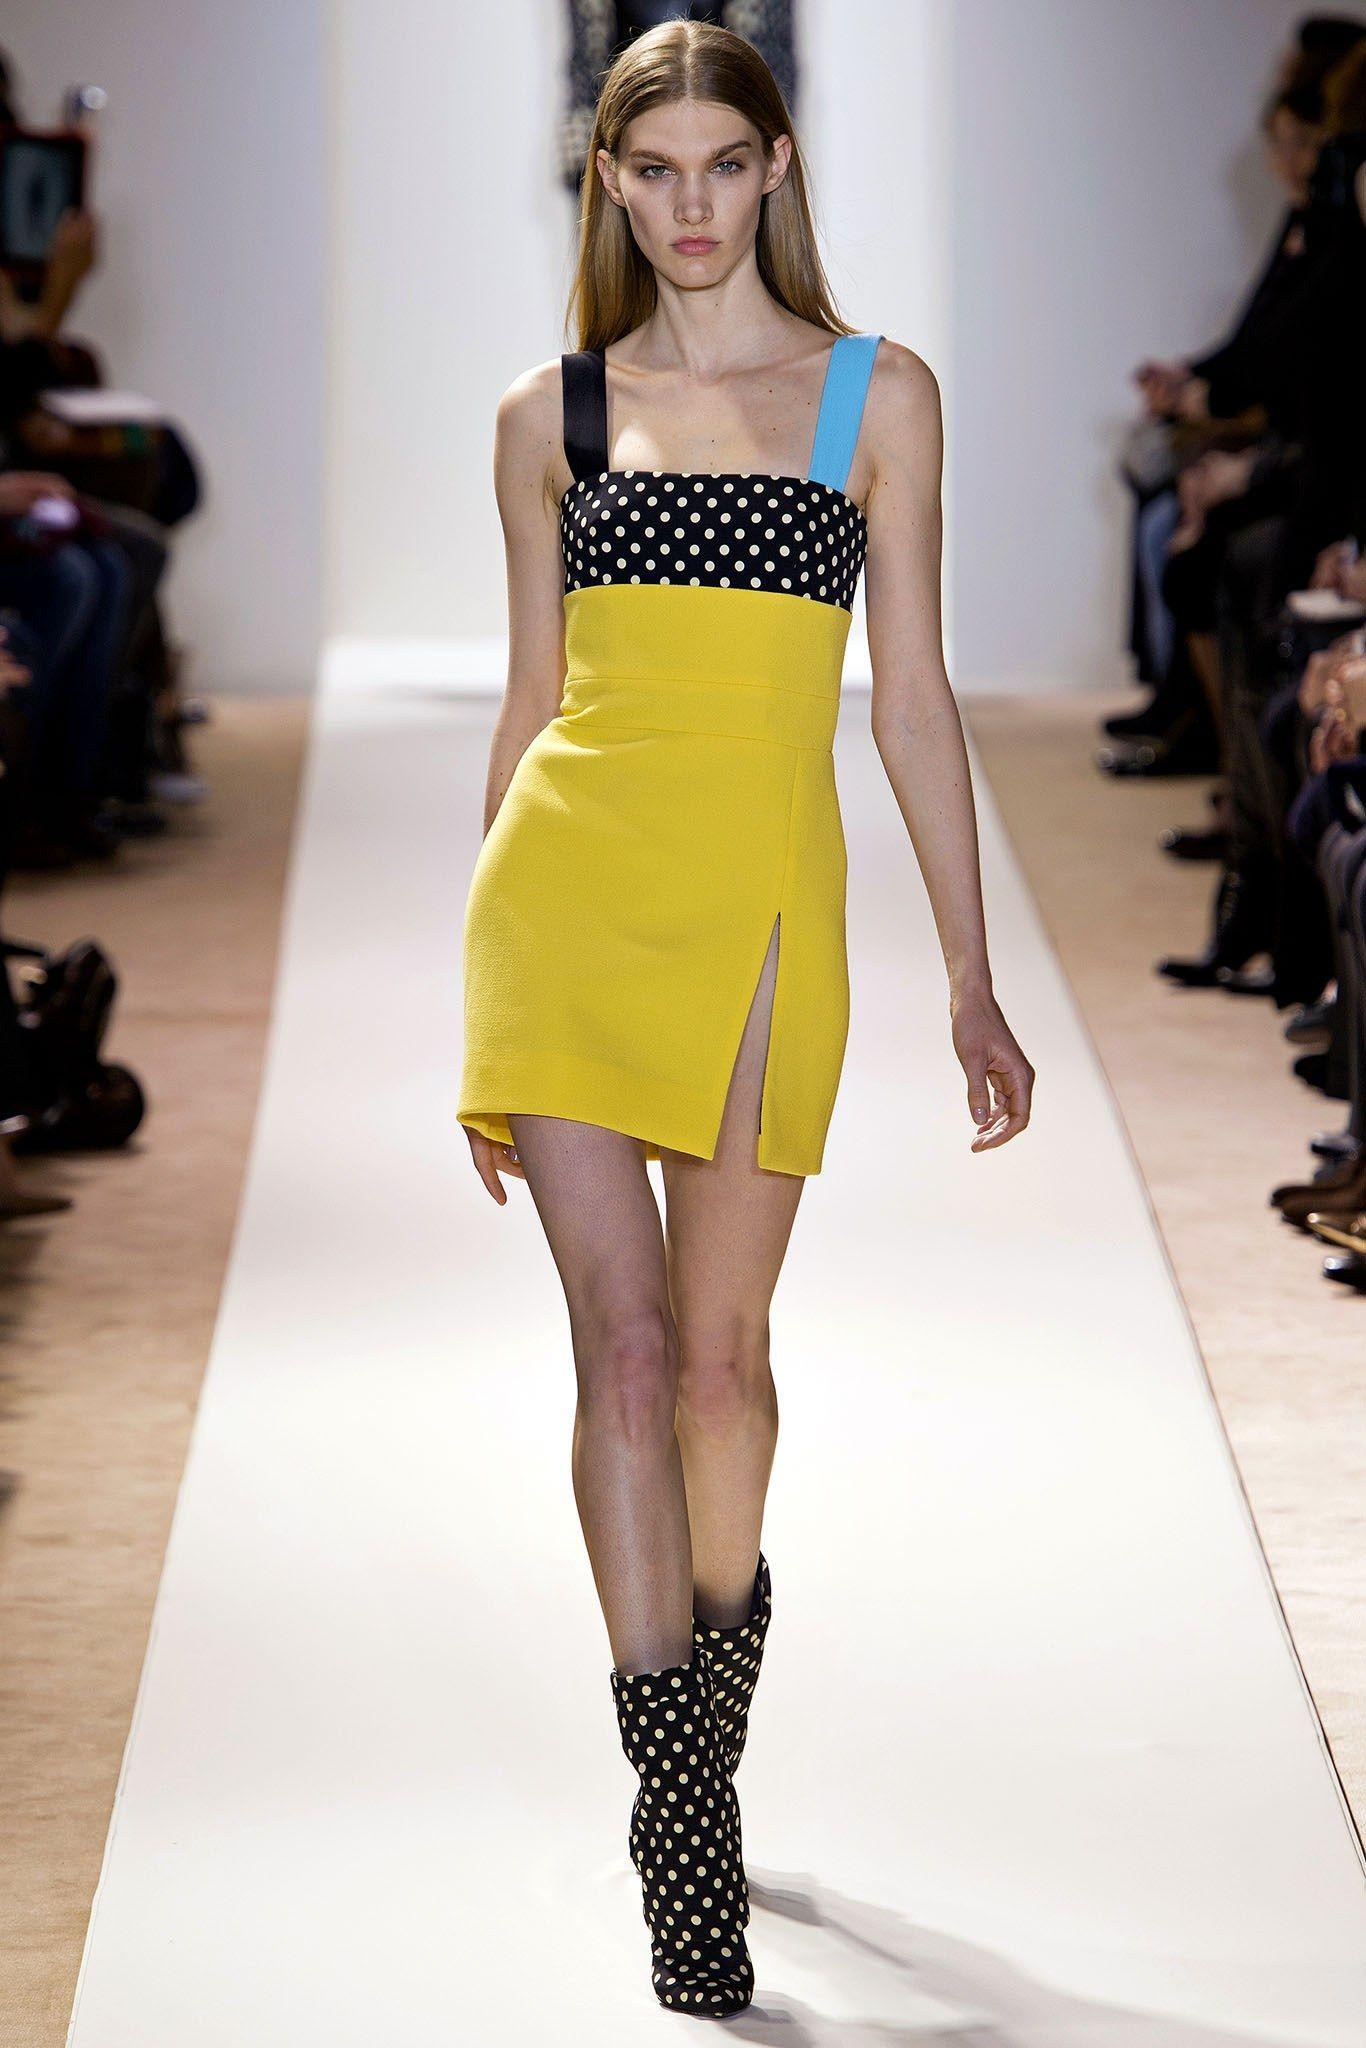 ungaro FallWinter 2013 Irina Nikolaeva Idées de mode